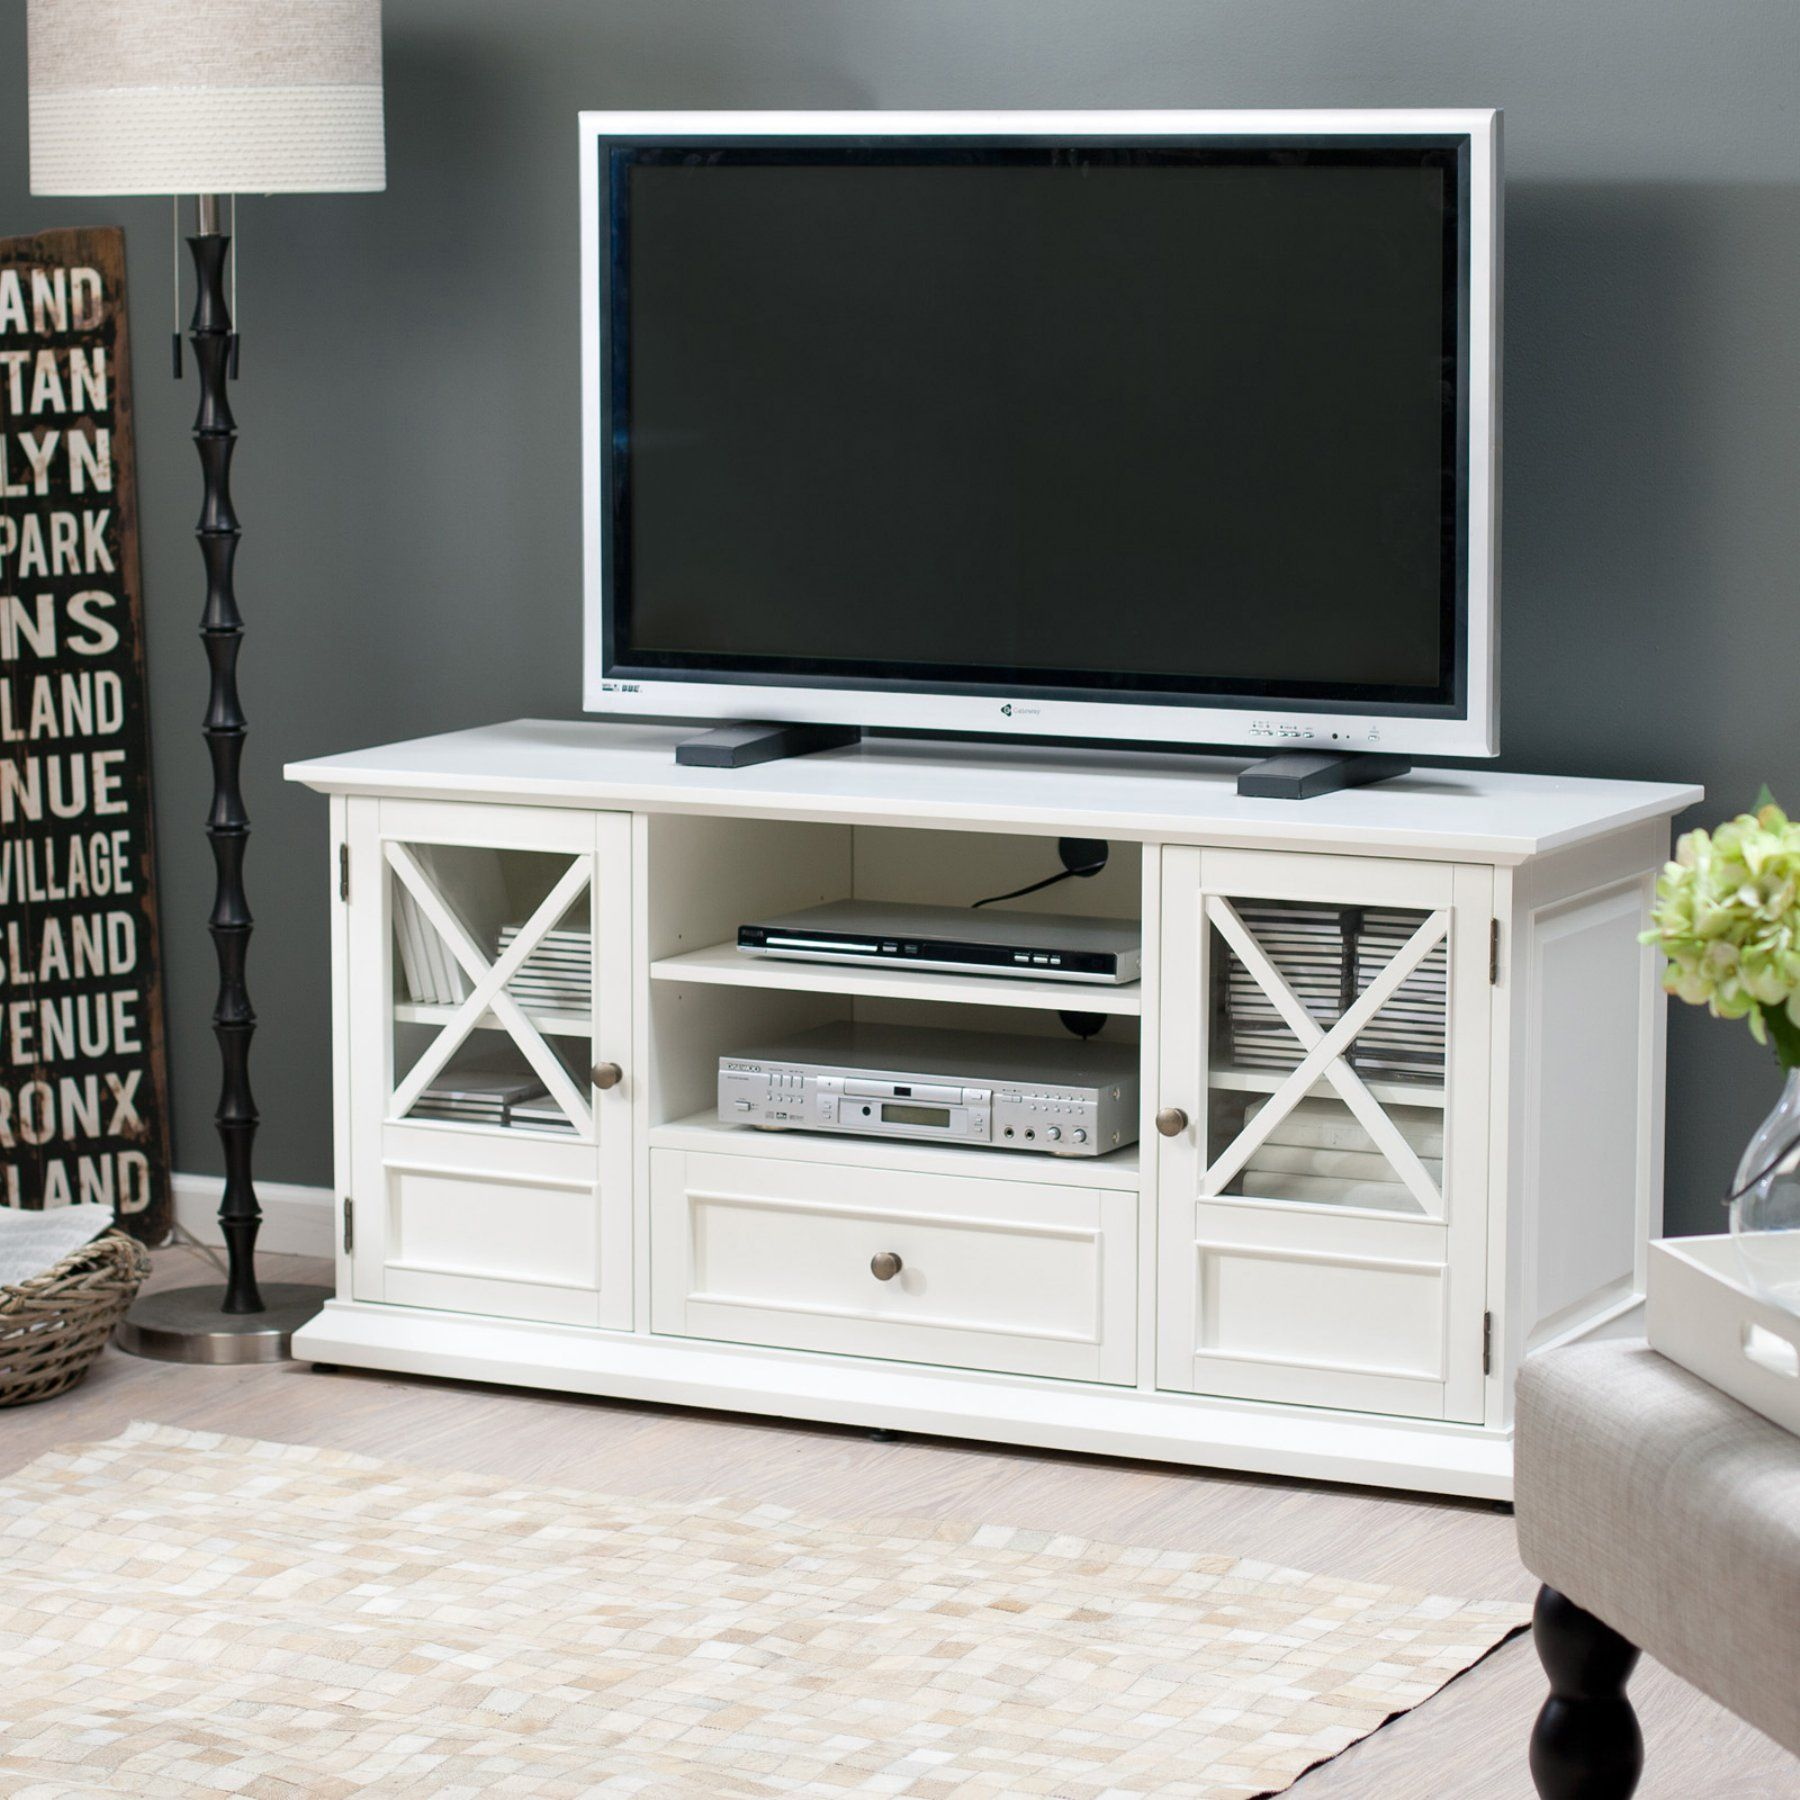 Belham Living Hampton TV Stand White KY314 WT NEW